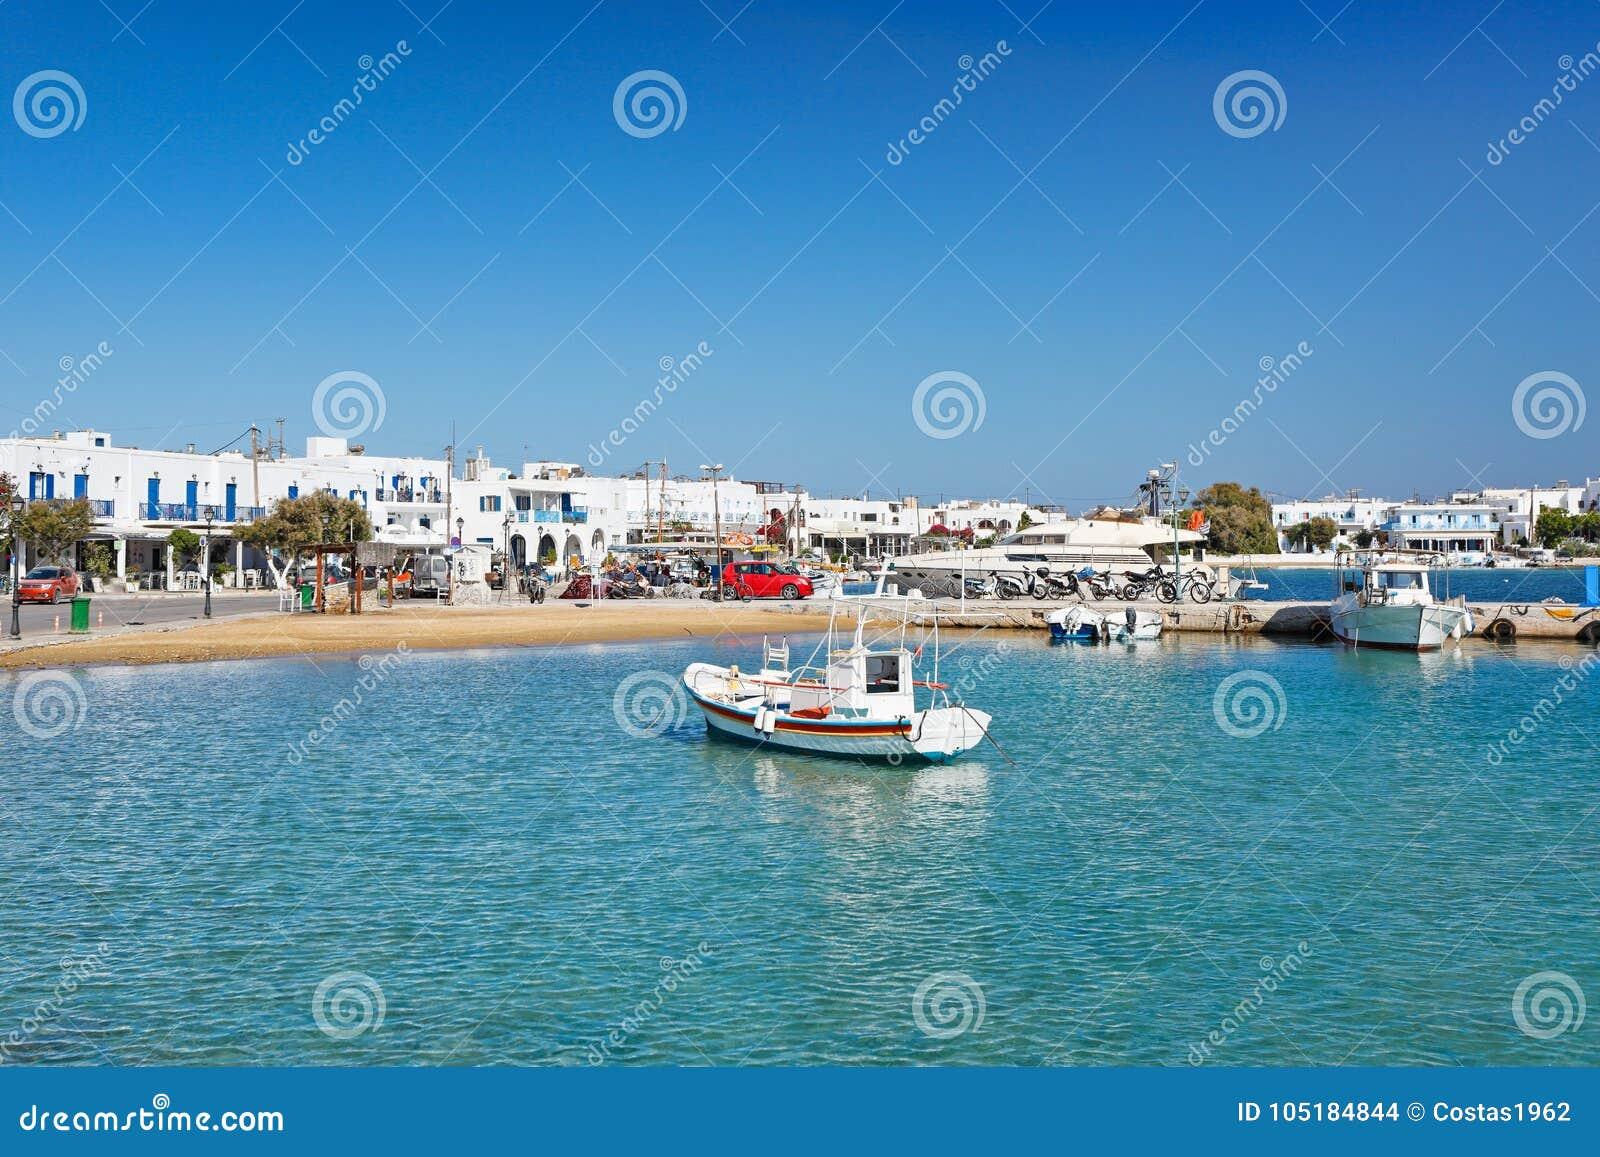 The port of Antiparos island, Greece